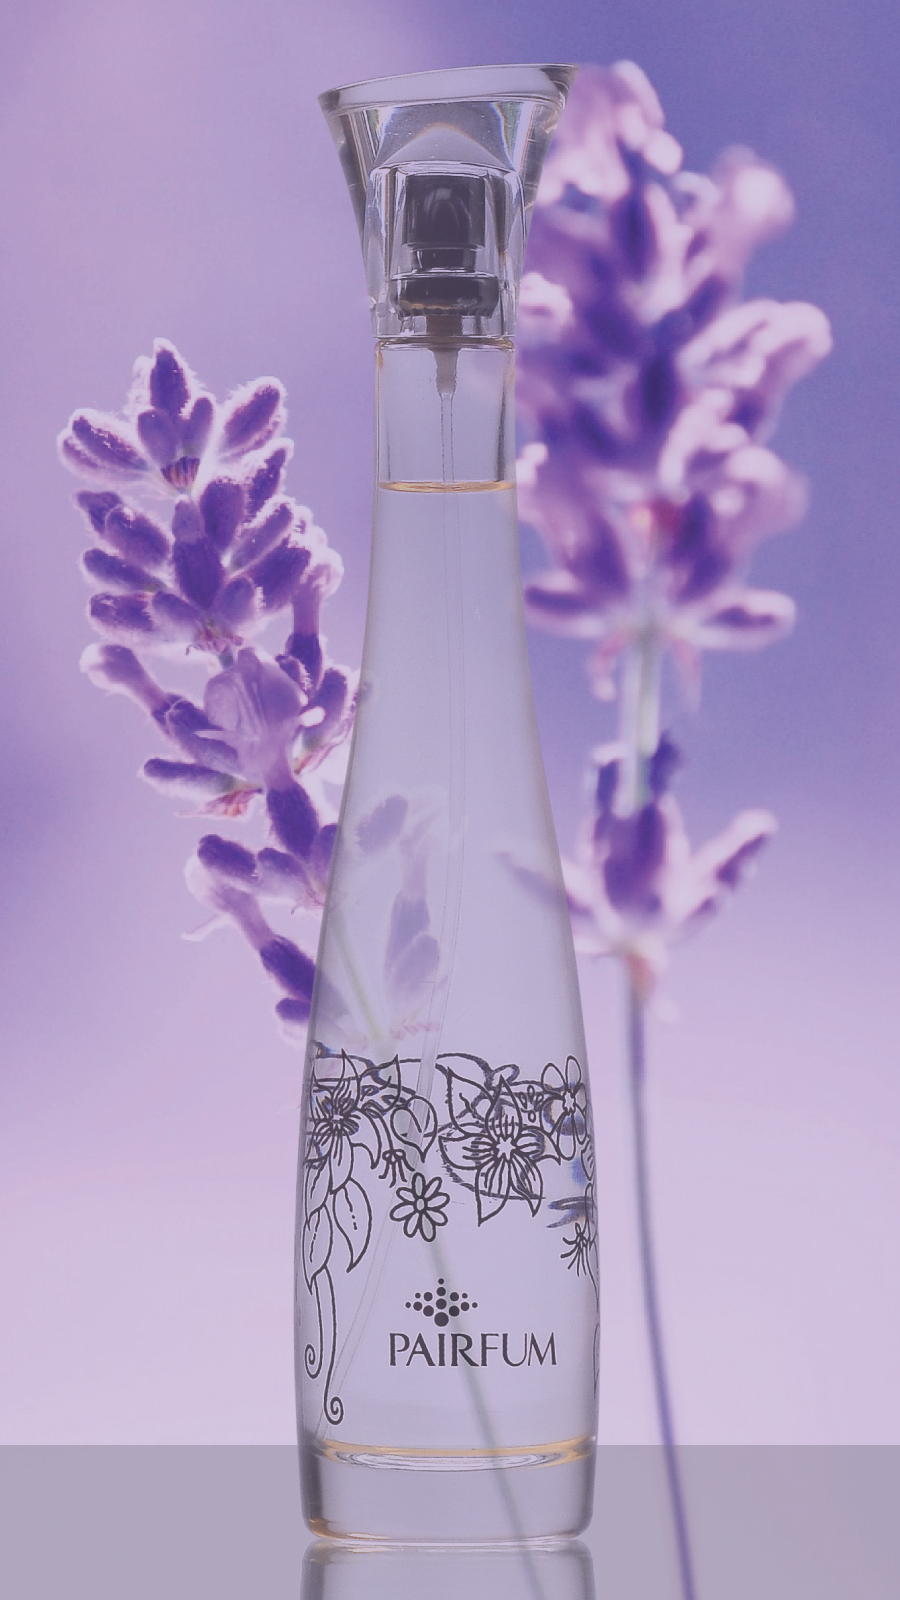 Flacon Room Perfume Spray Lavender Flower 9 16